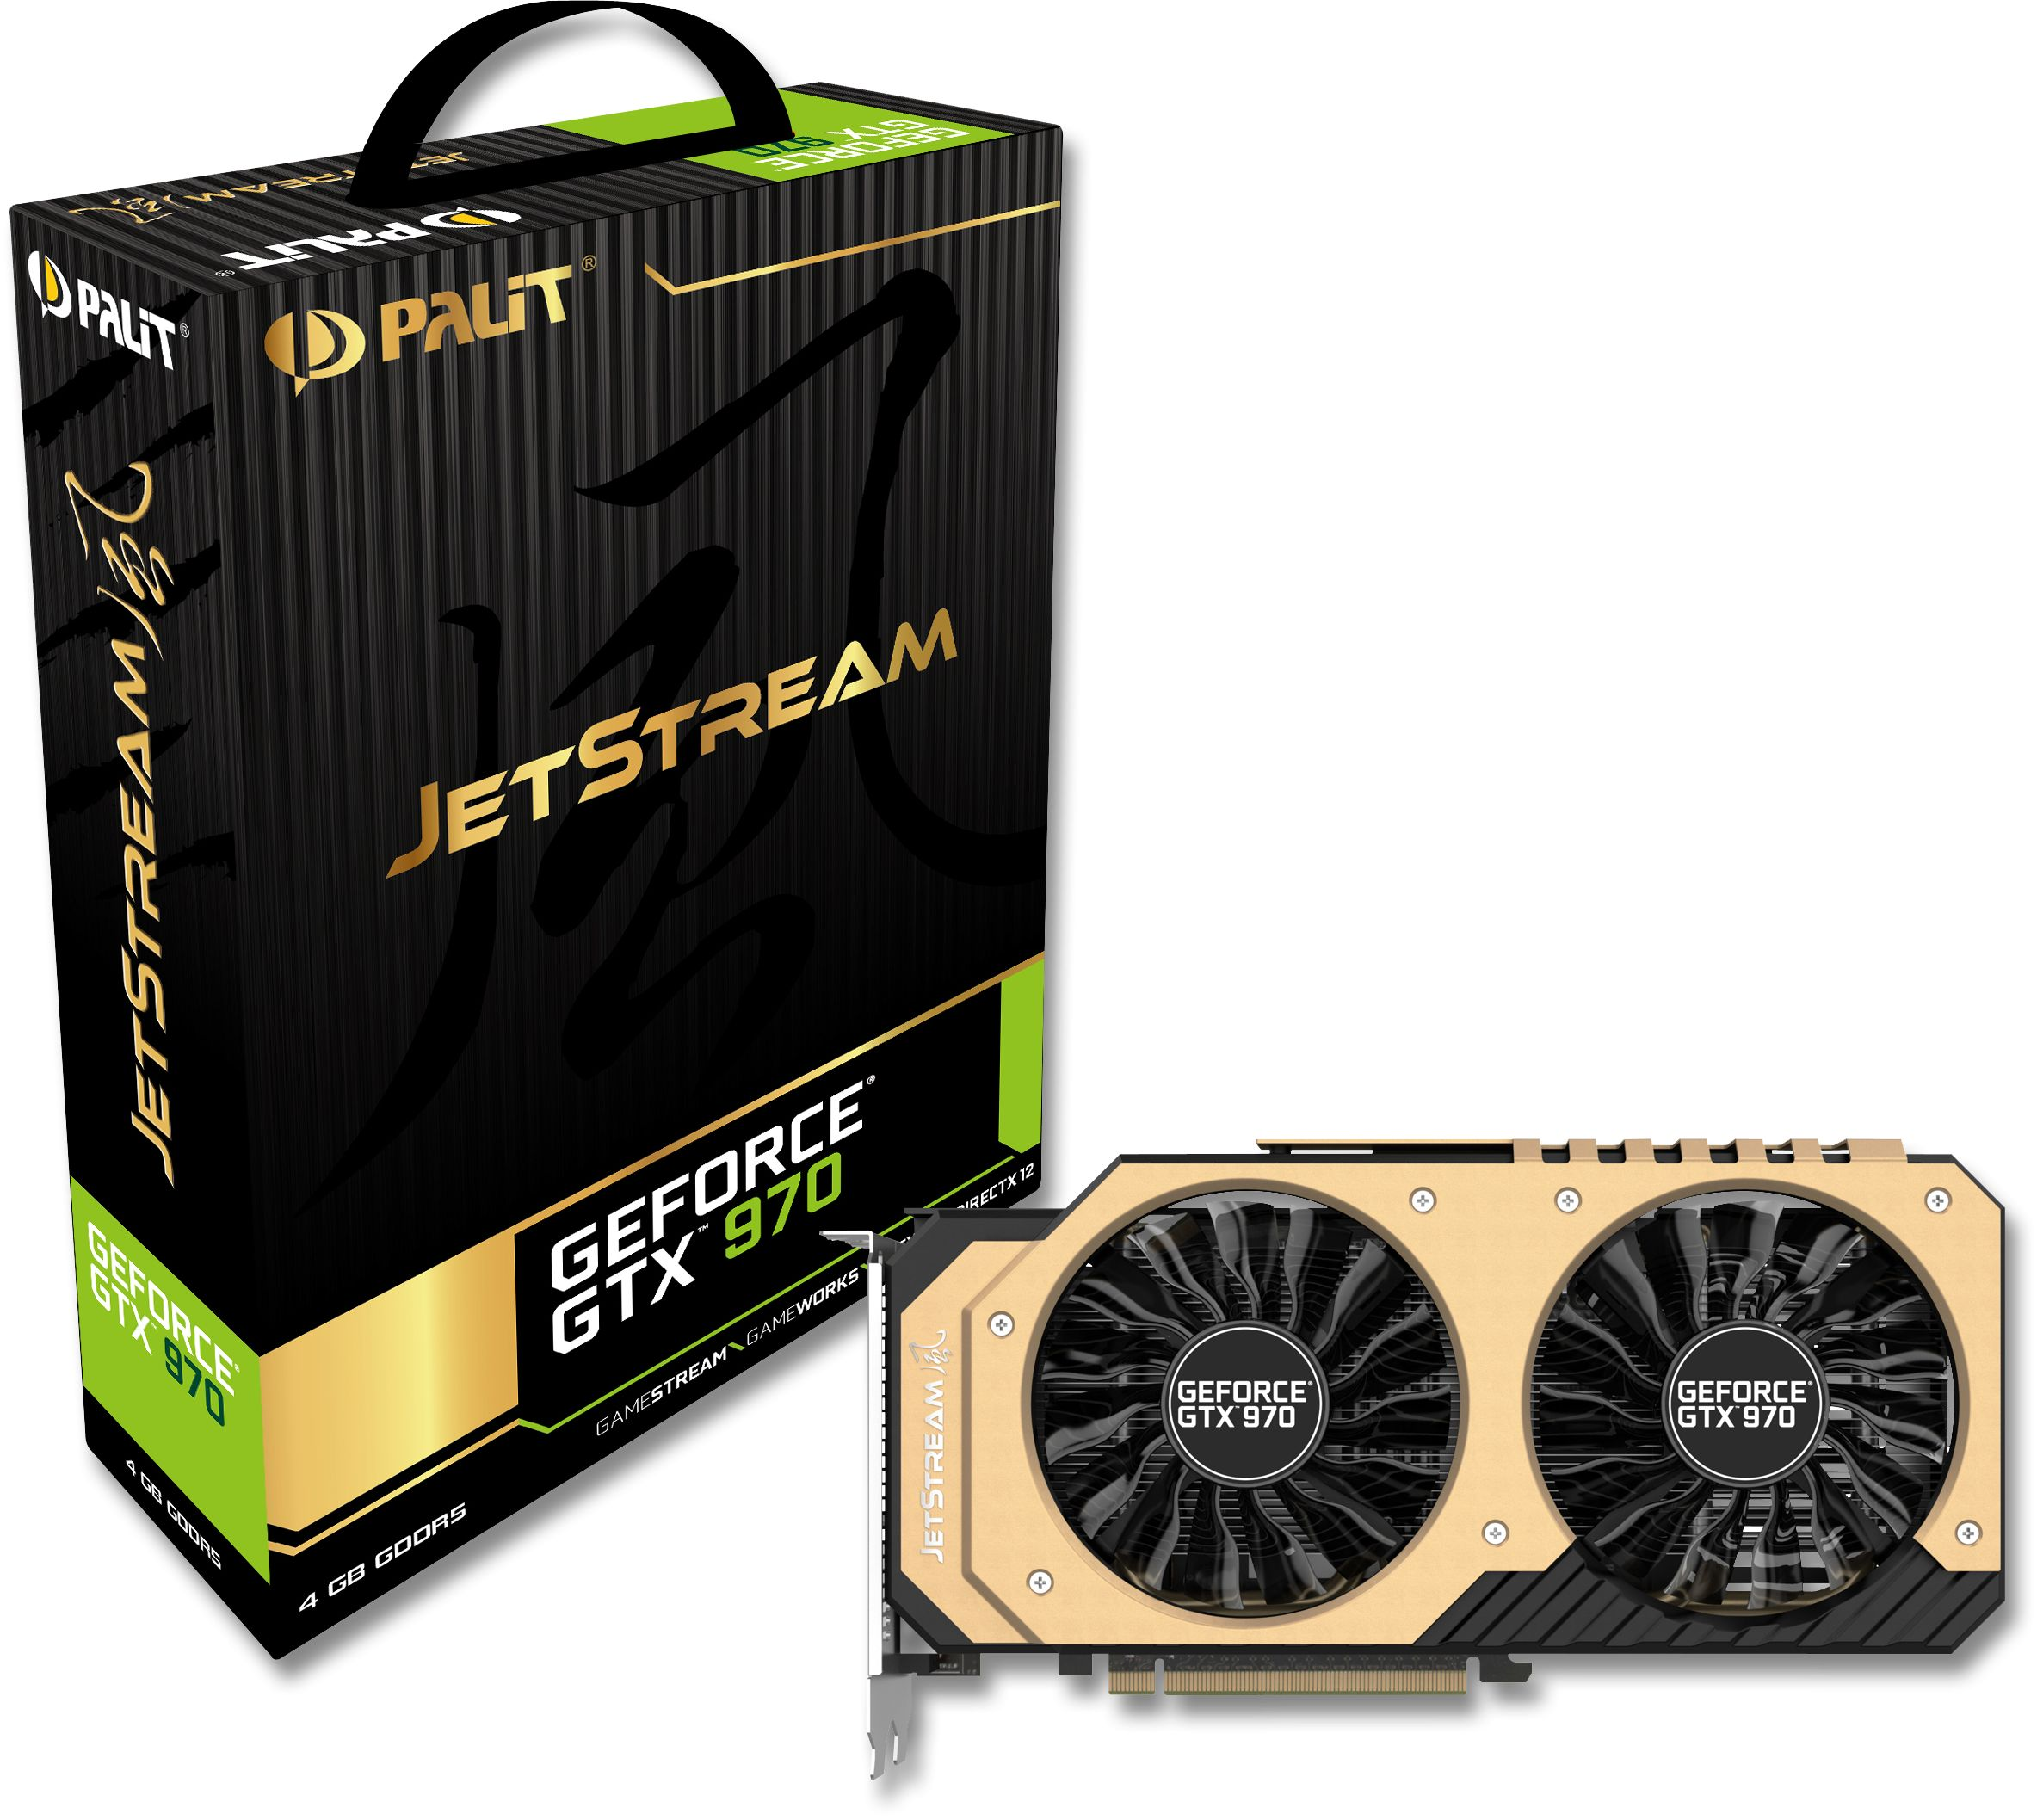 Geforce Gtx 970 Jetstream 4gb Gddr5 Graphics Card